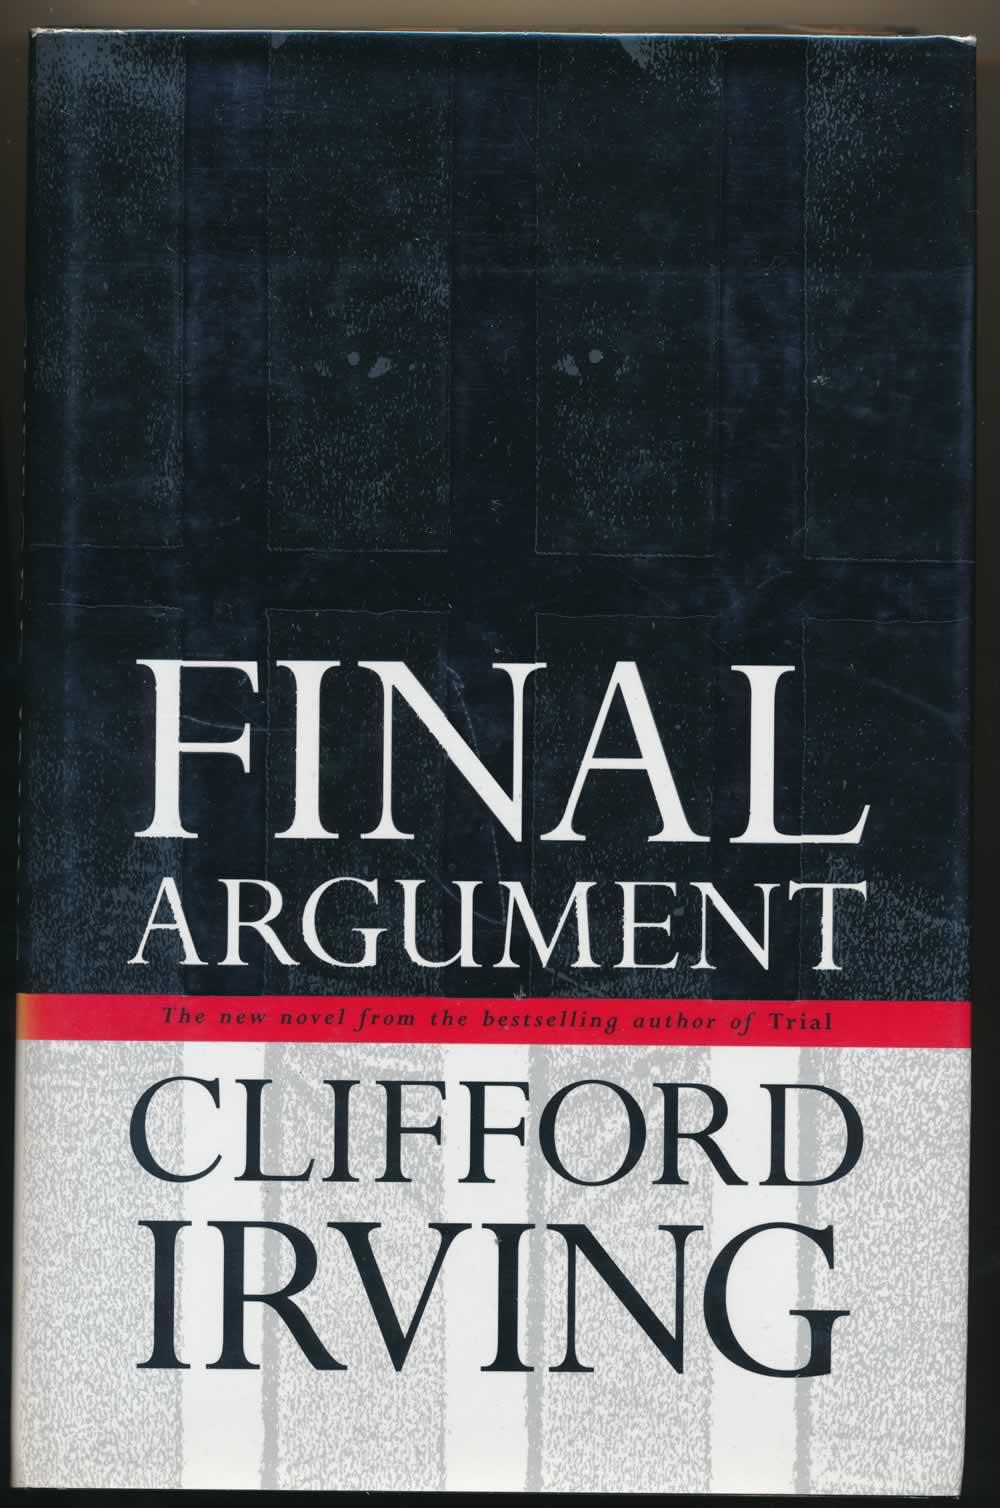 Final argument : a novel